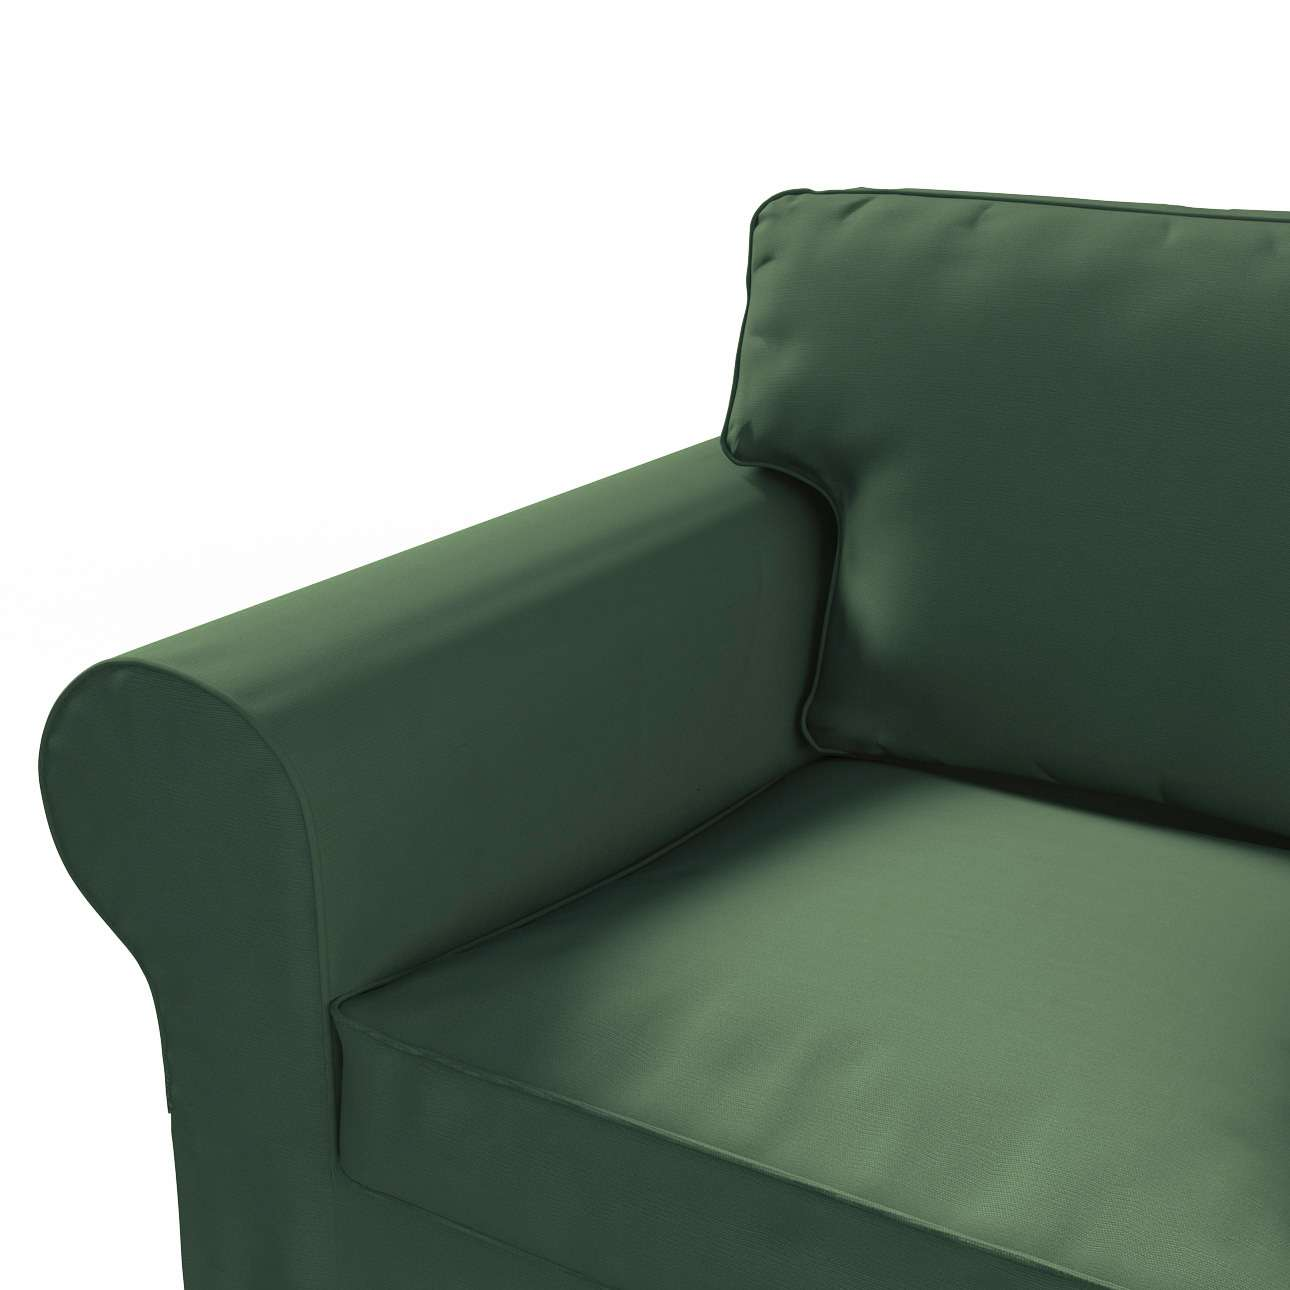 Ektorp 2 sæder sovesofa fra 2012<br/>Bredde ca 200cm fra kollektionen Cotton Panama, Stof: 702-06